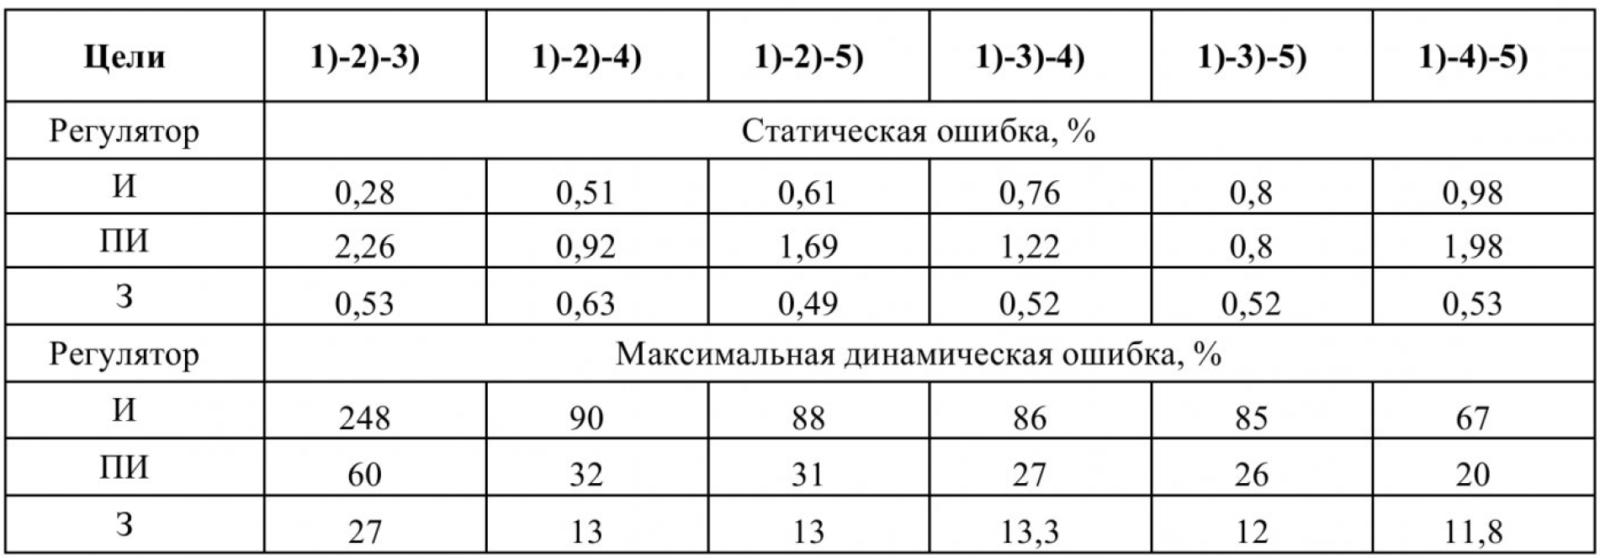 Таблица 2 – Ошибки регулирования электромагнитного момента